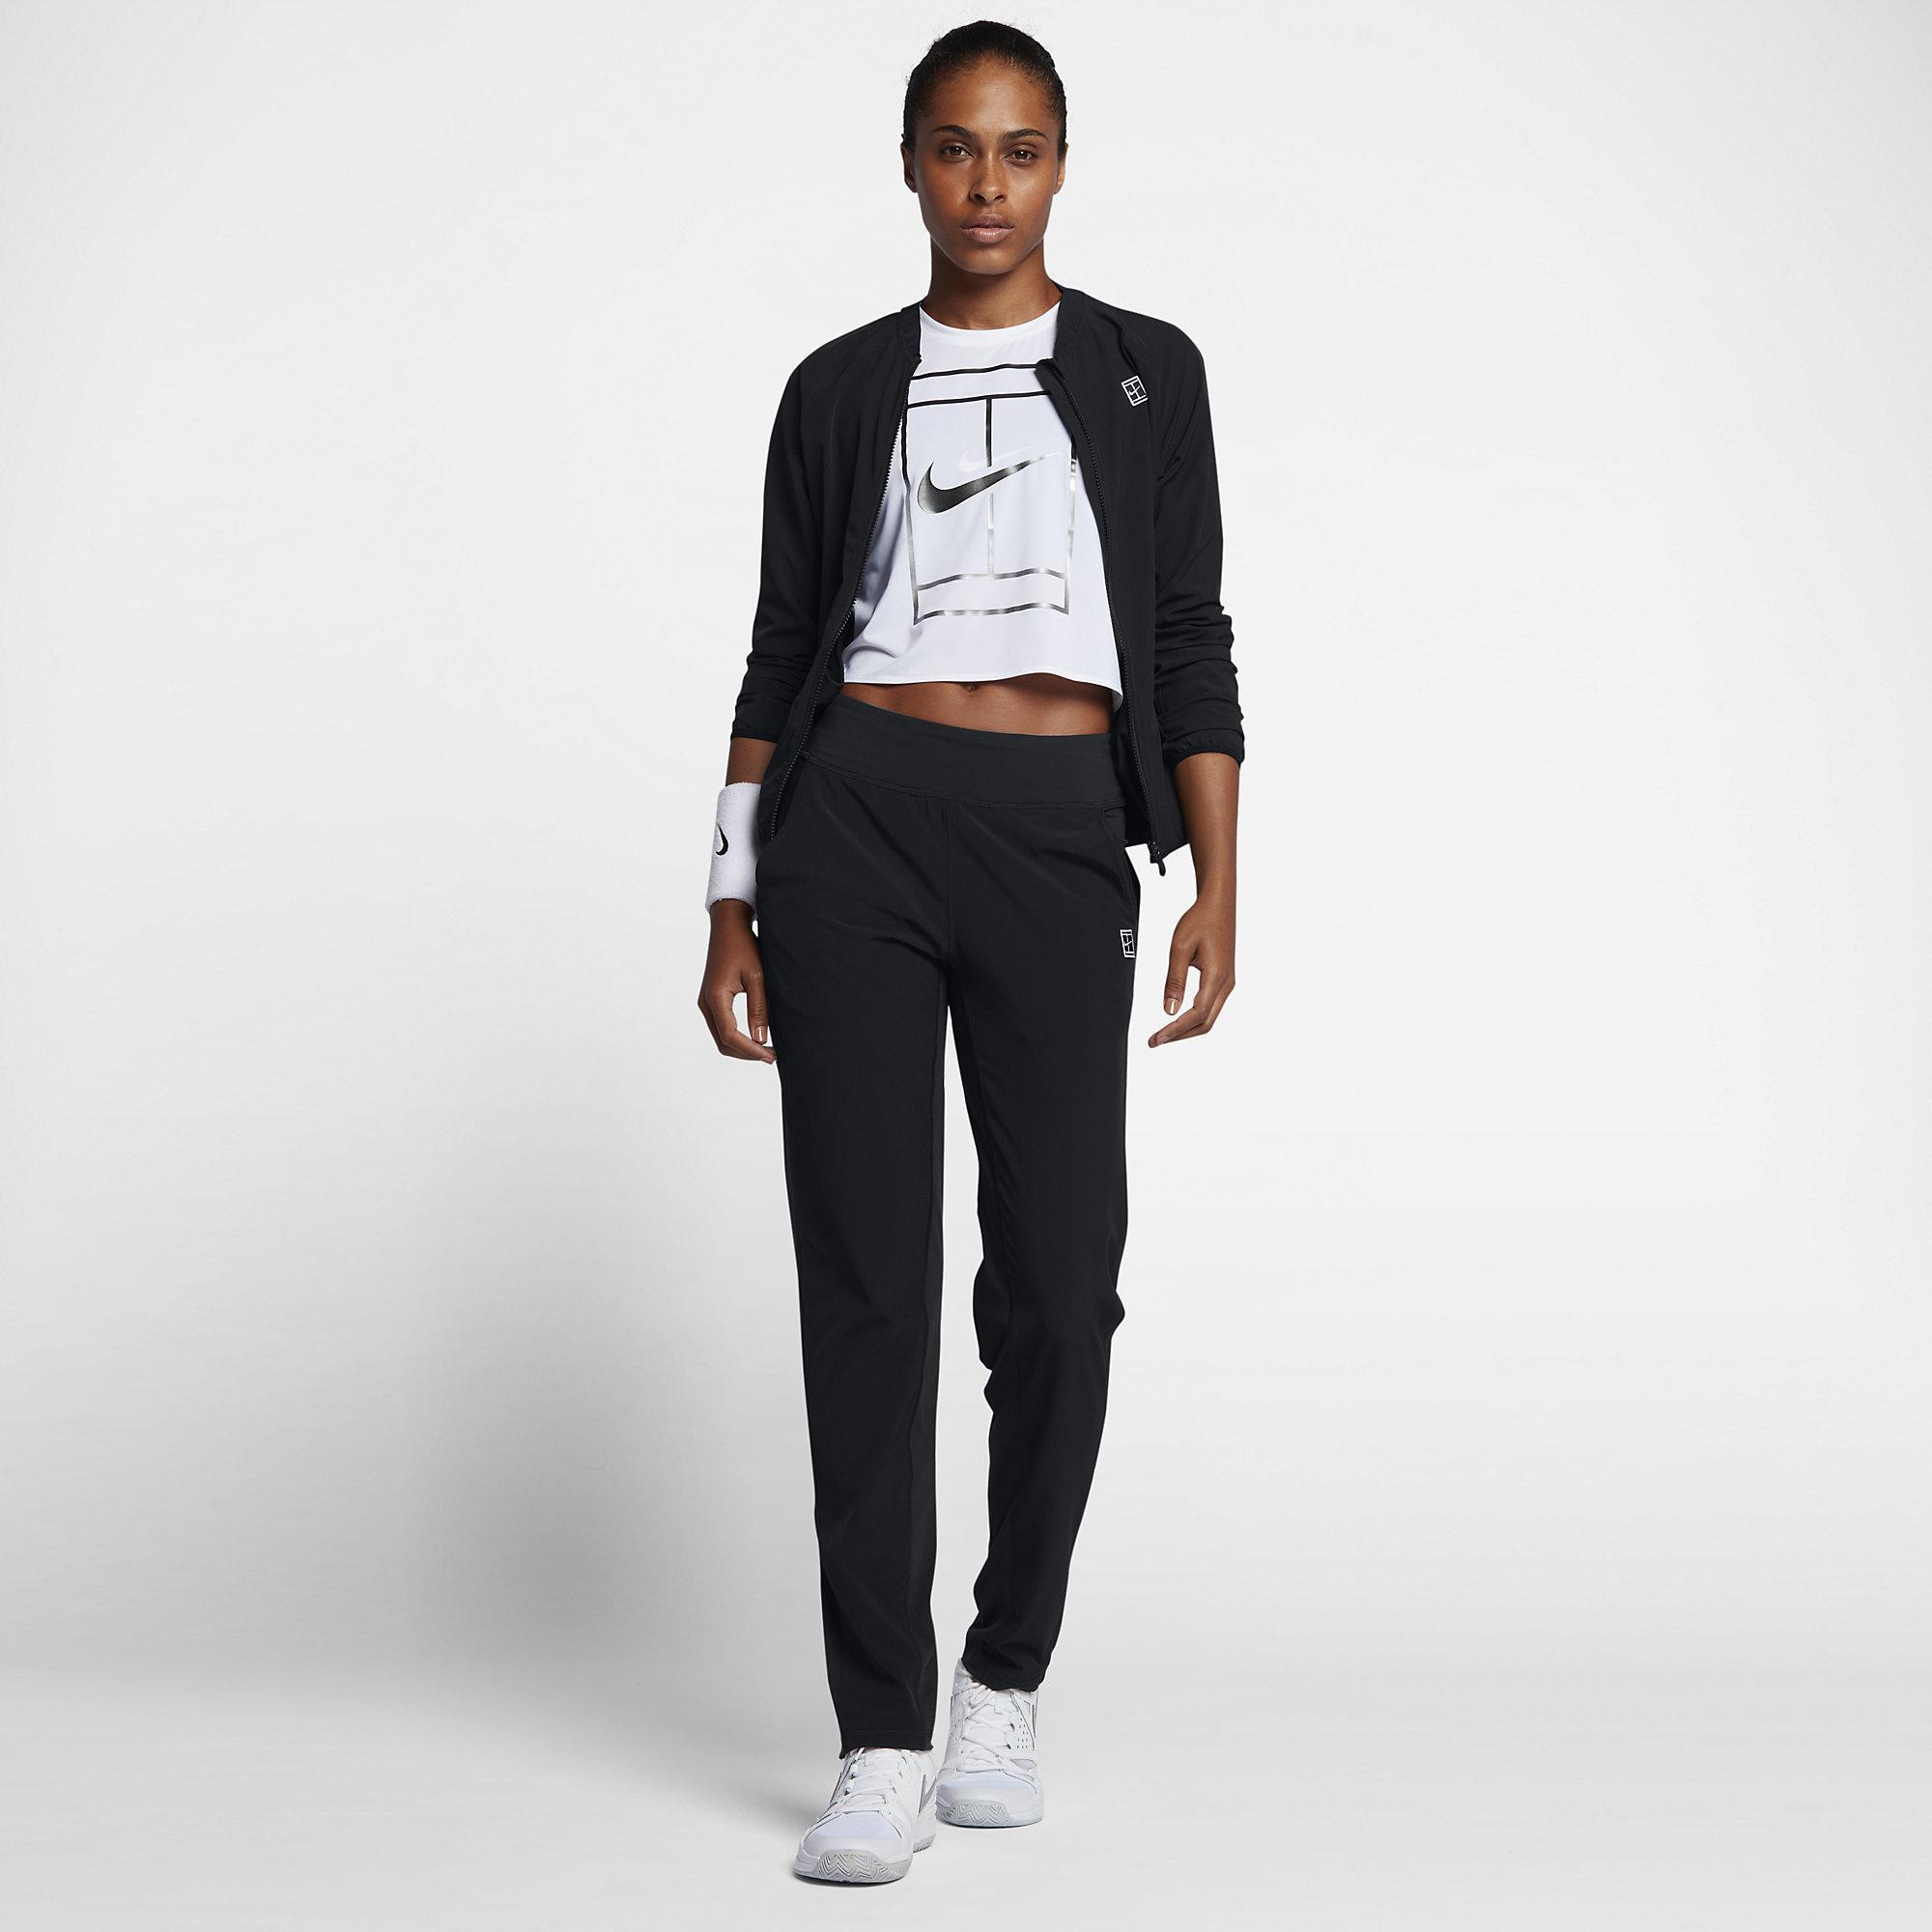 Nike Womens Tennis Warm Up Tracksuit Black White